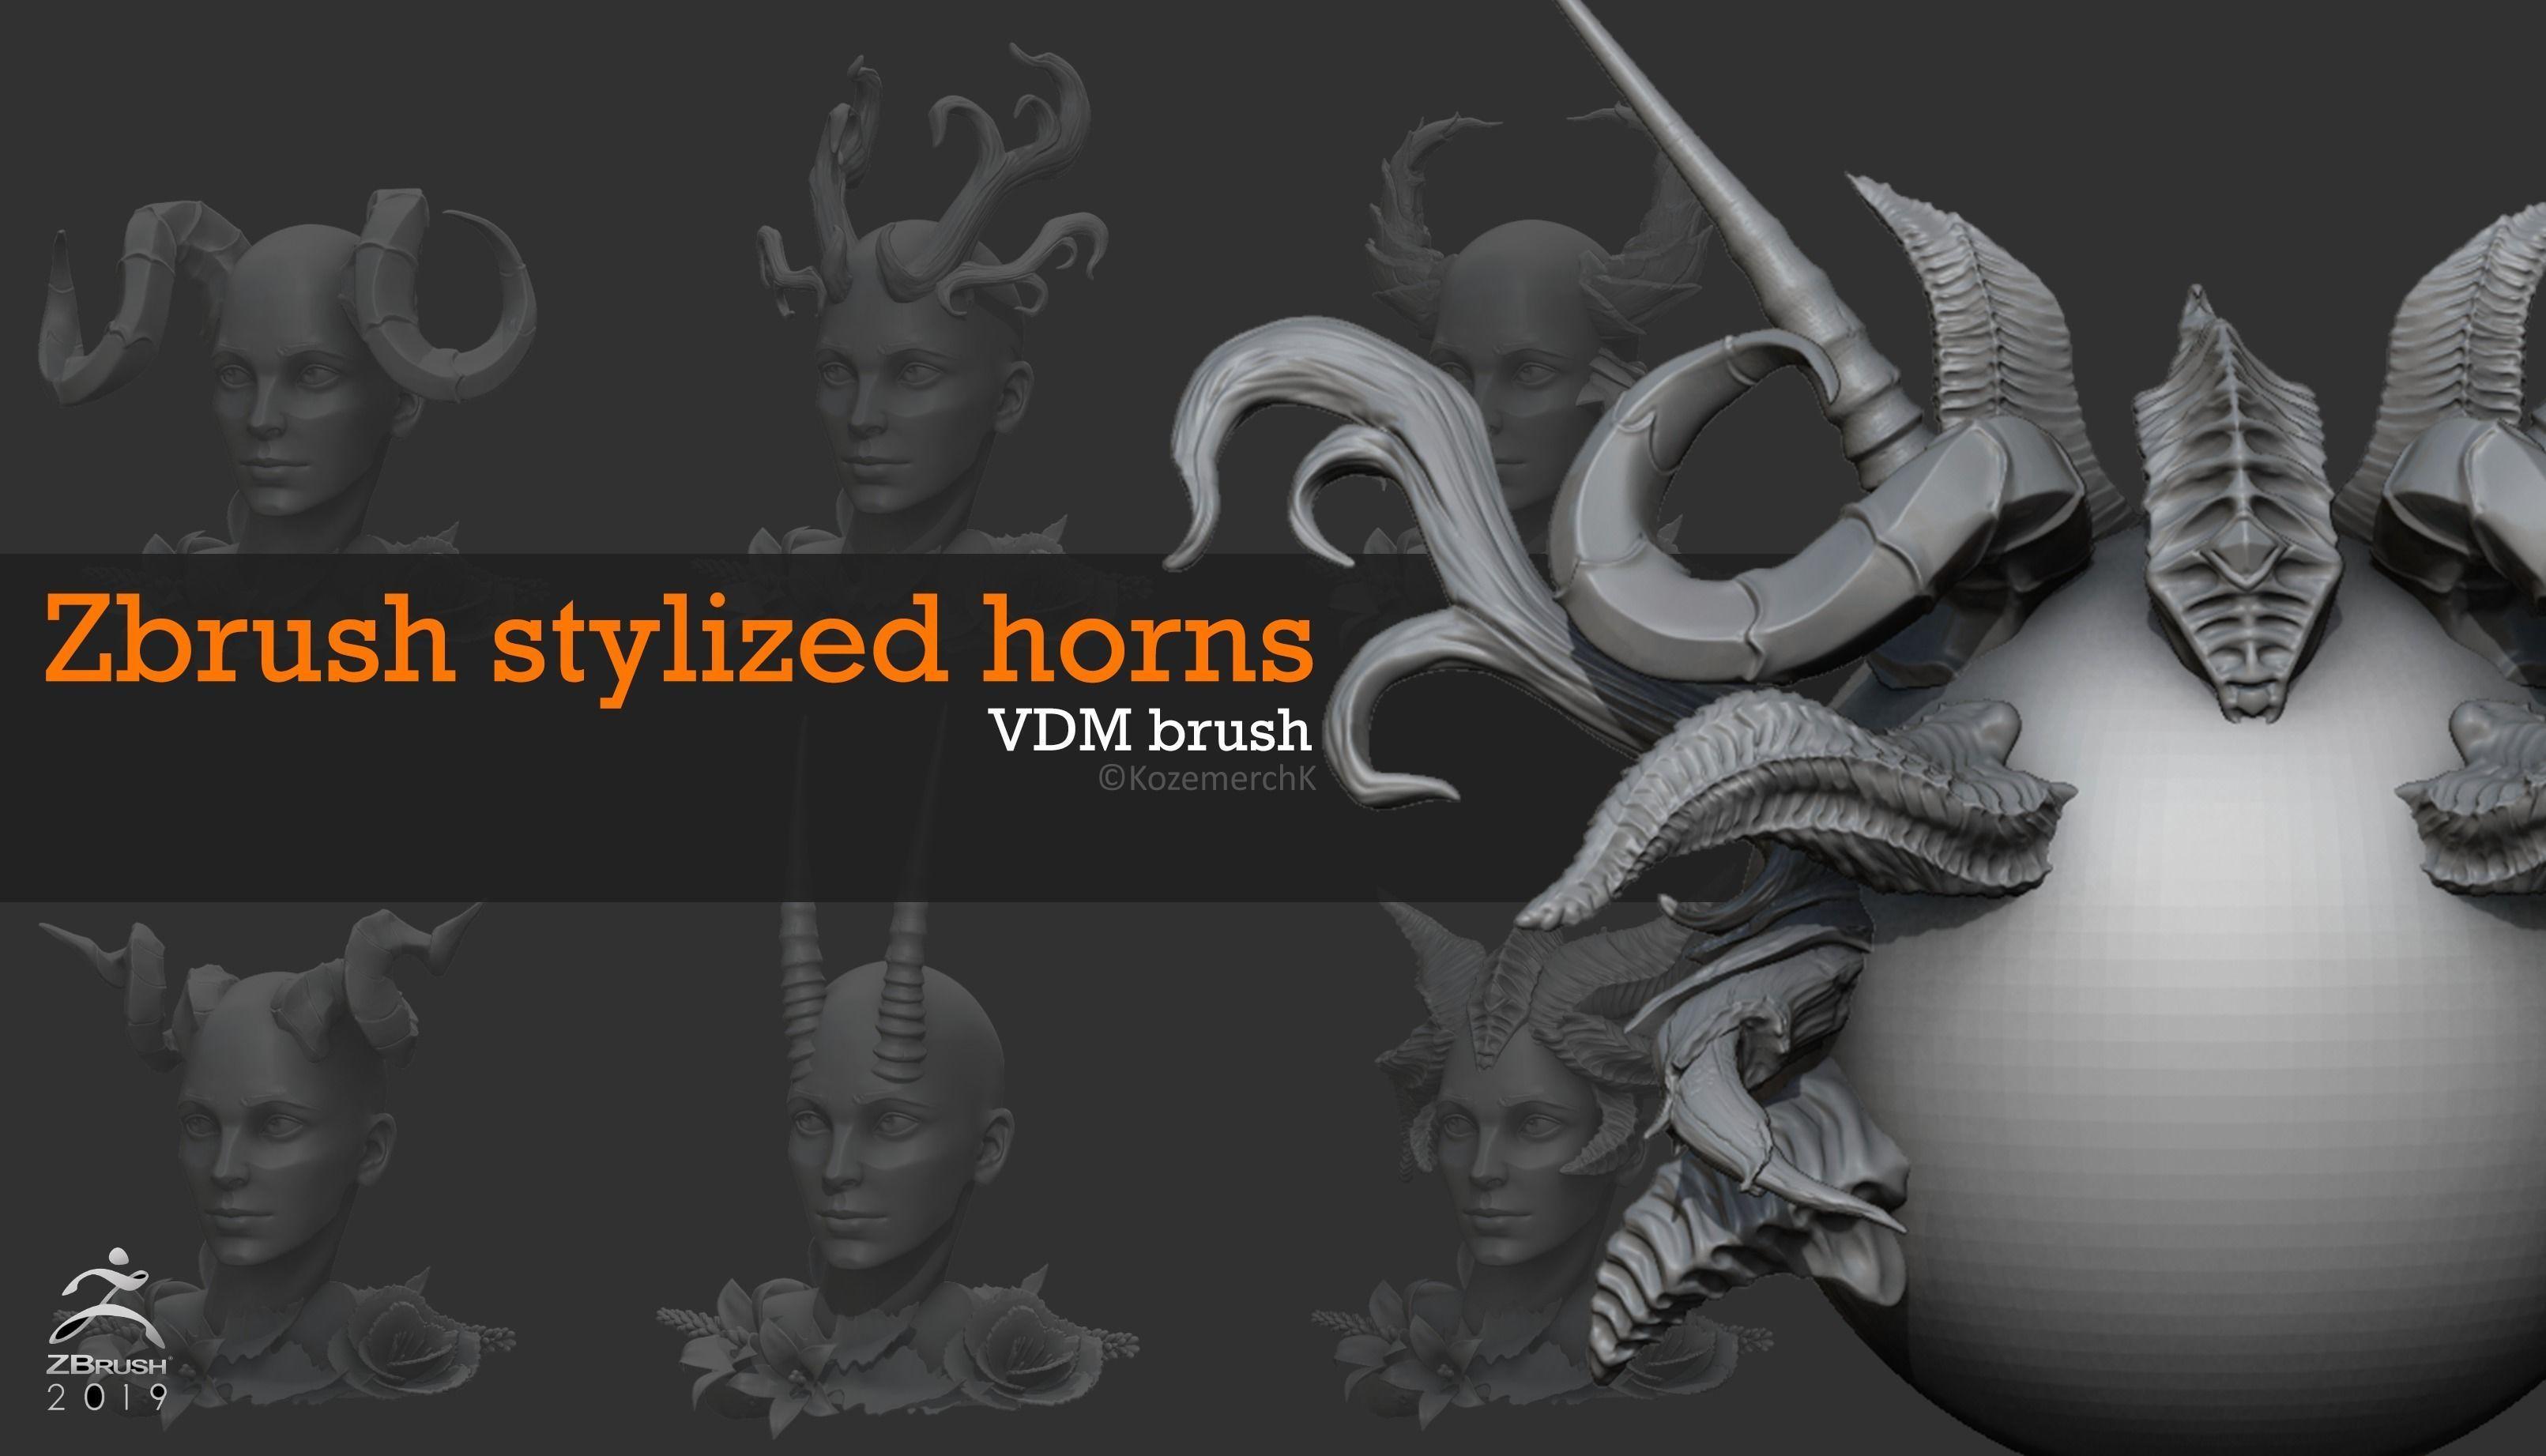 Free horns pack